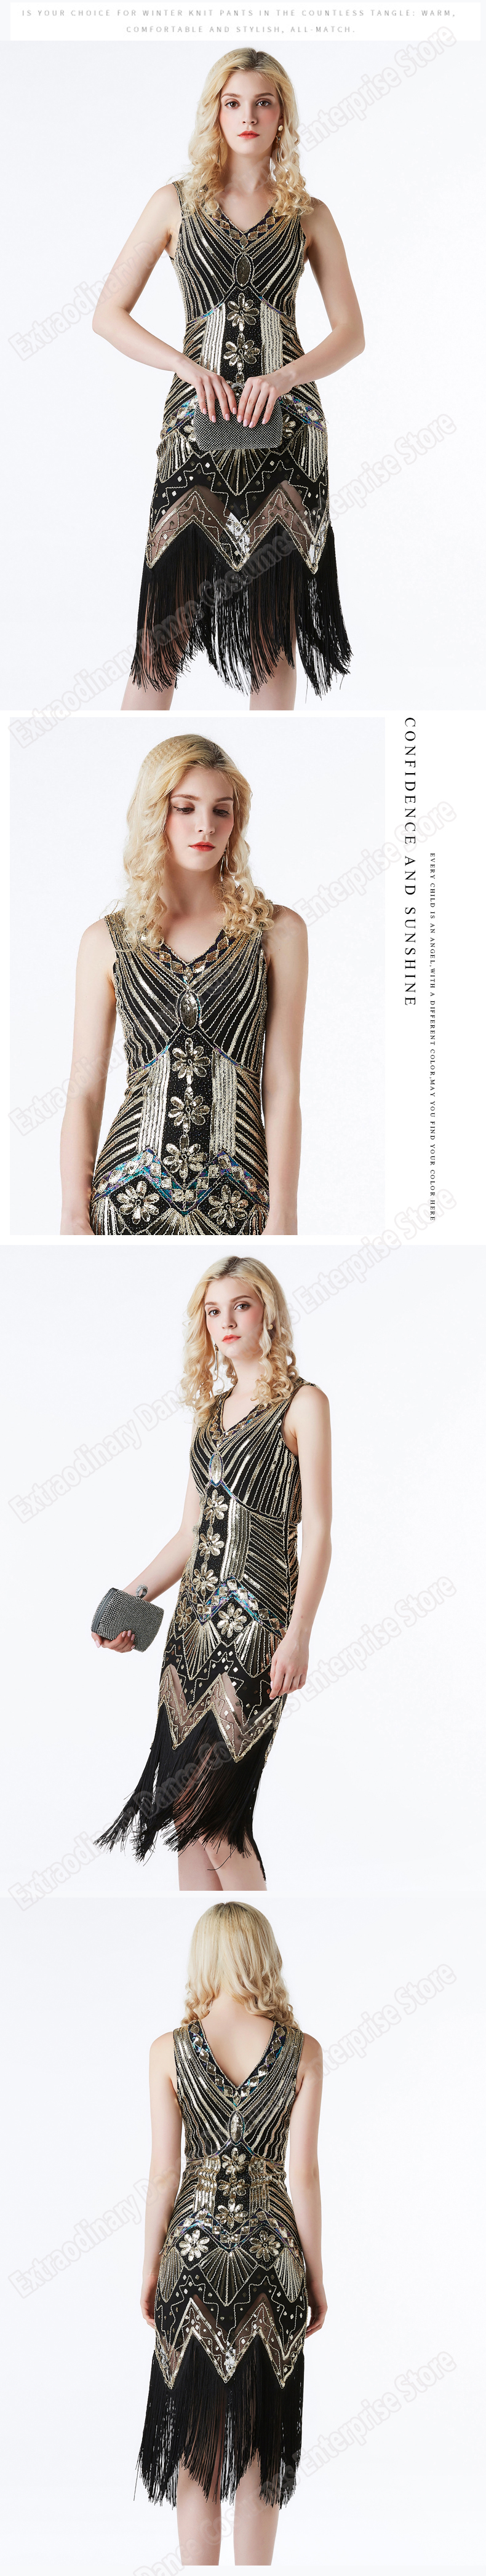 Women 1920s Vintage V-Neck Tassels Bodycon Beaded Party Dress